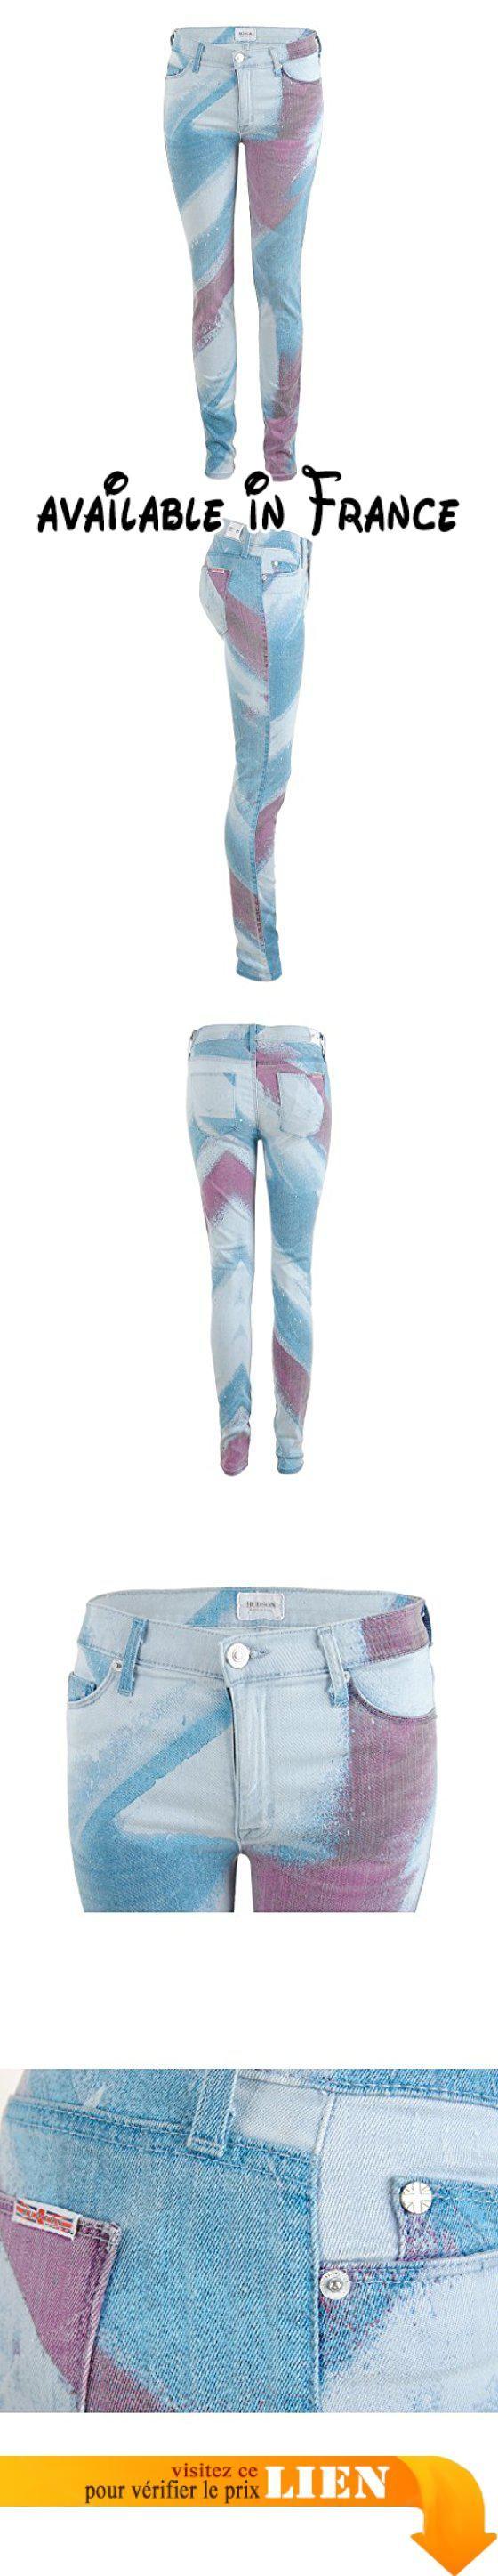 B00C2C3UAQ : Hudson Super Skinny Jeans NICO midrise Gr. 28. Hudson Super Skinny Jeans NICO midrise Gr. 28 | Jeans online kaufen #Apparel #PANTS